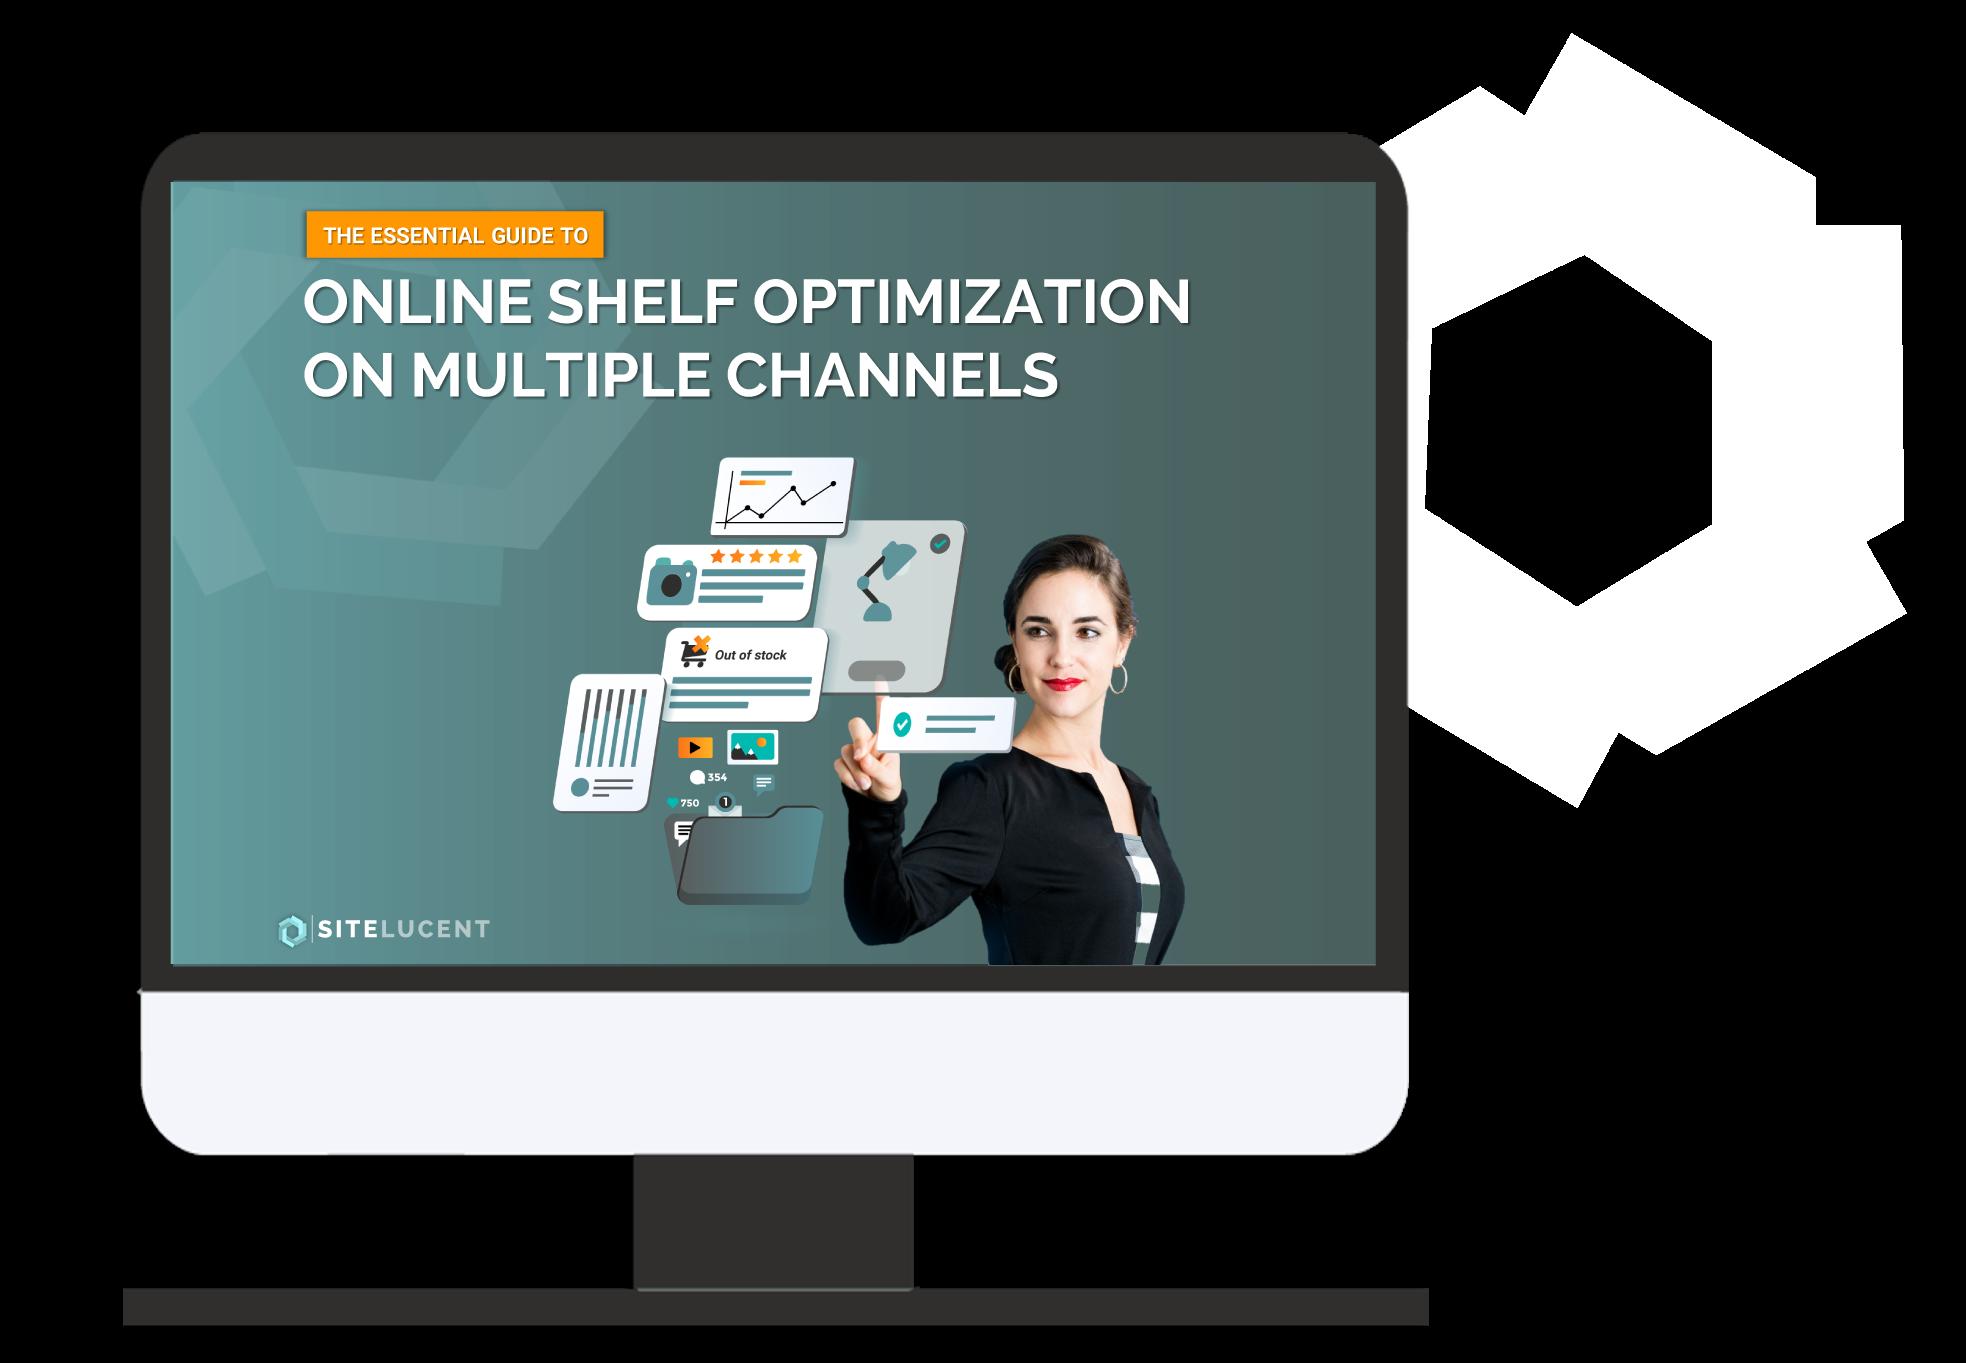 Online shelf optimization